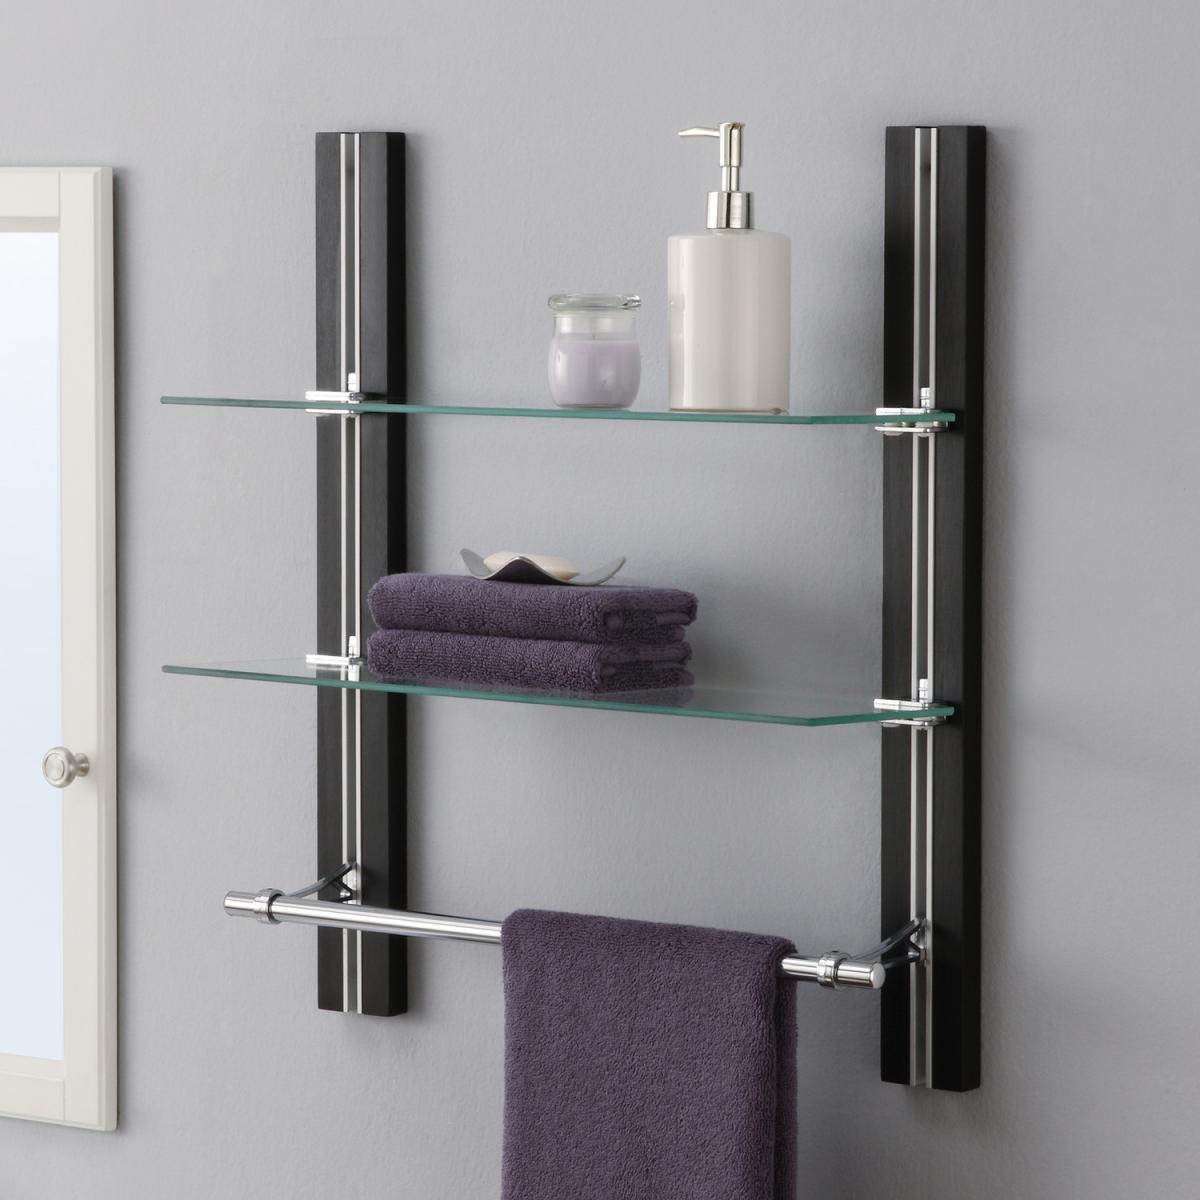 Bathroom Glass Shelf Organizer with Towel Holder 2 Tire Adjustable ...